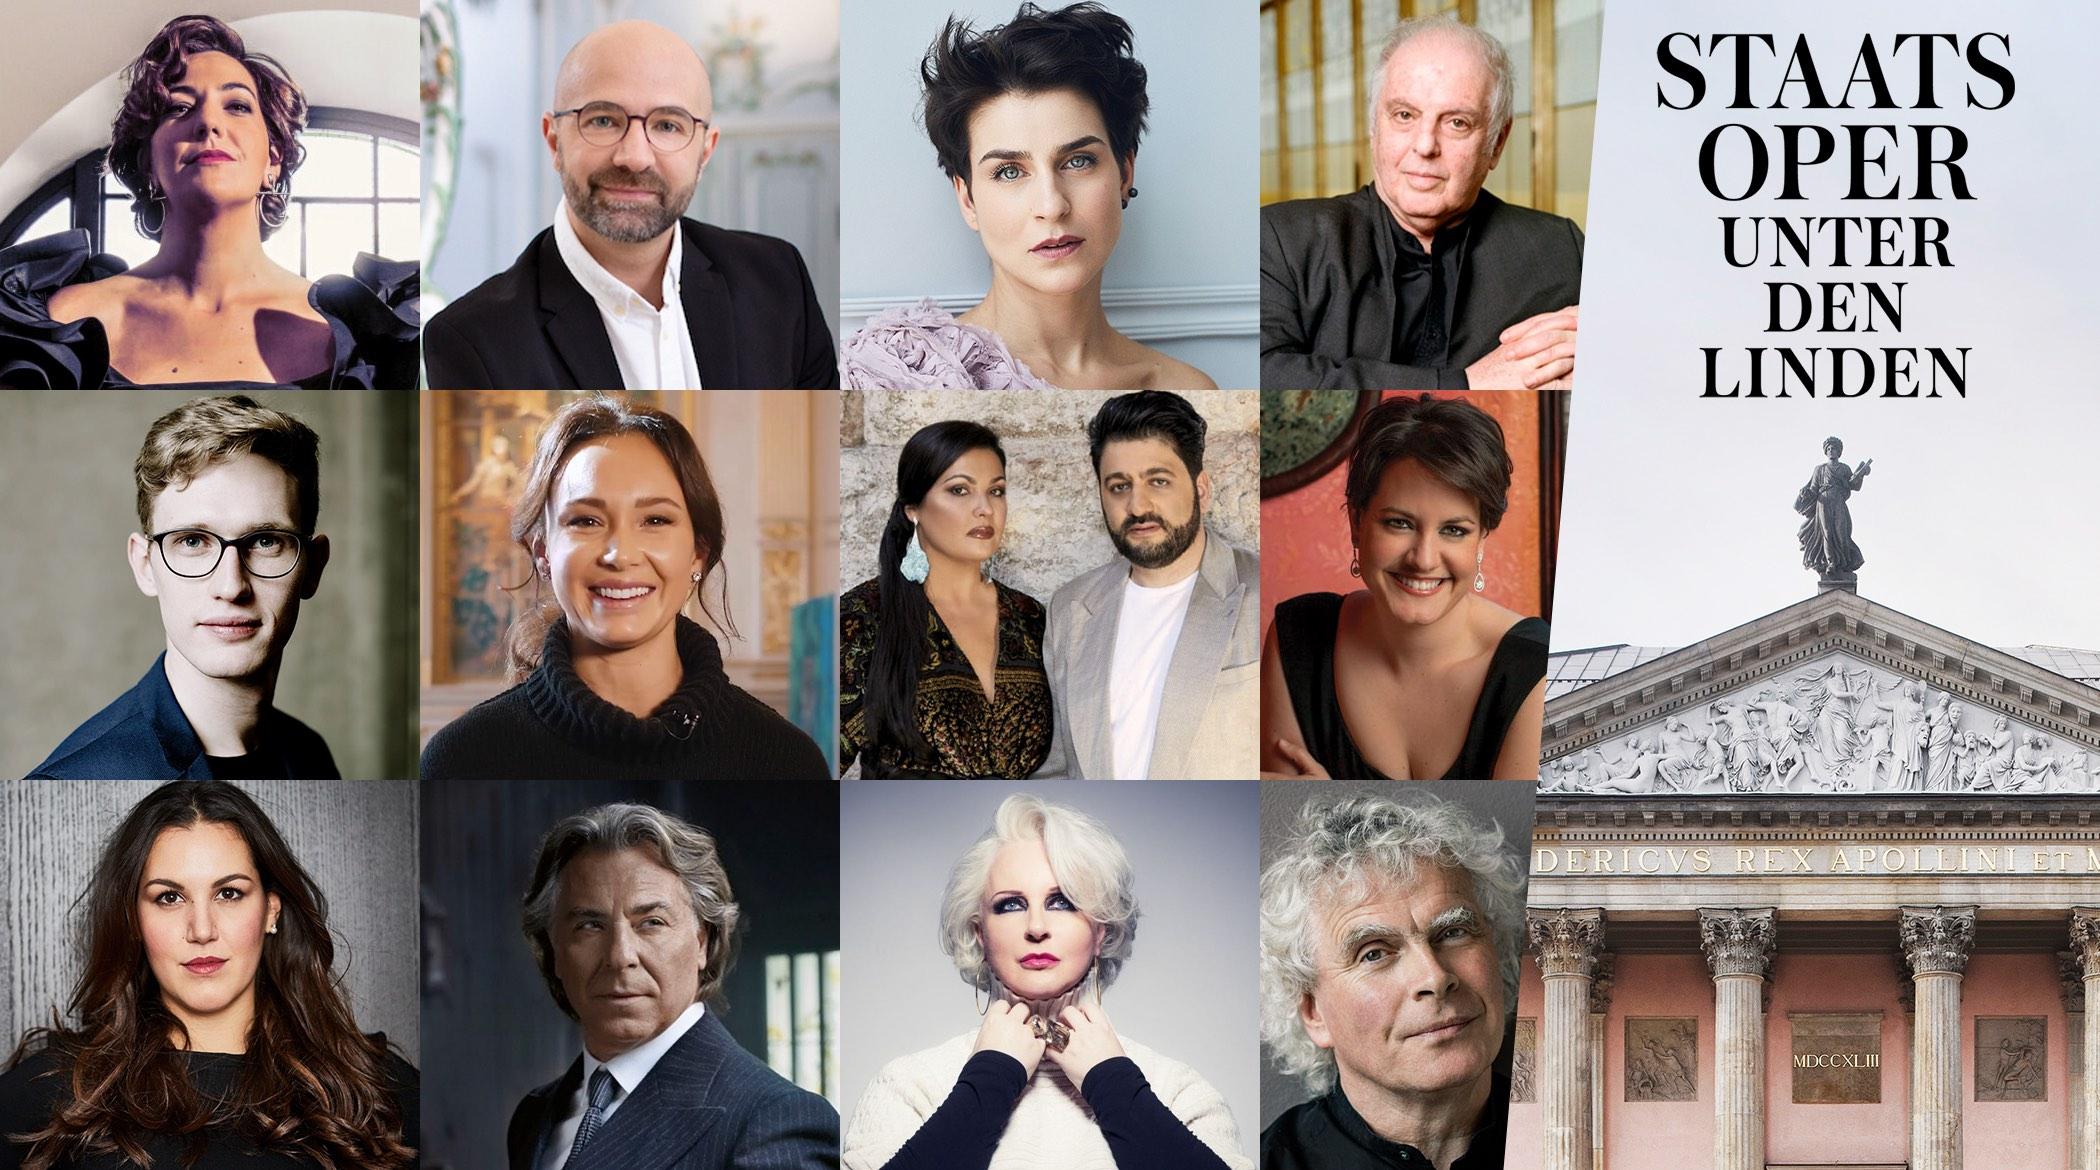 staatsoper Berlino 21/22; opera Lirica; Staatsoper Unter den Linden Berlin; Daniel Barenboim; Anna Netrebko